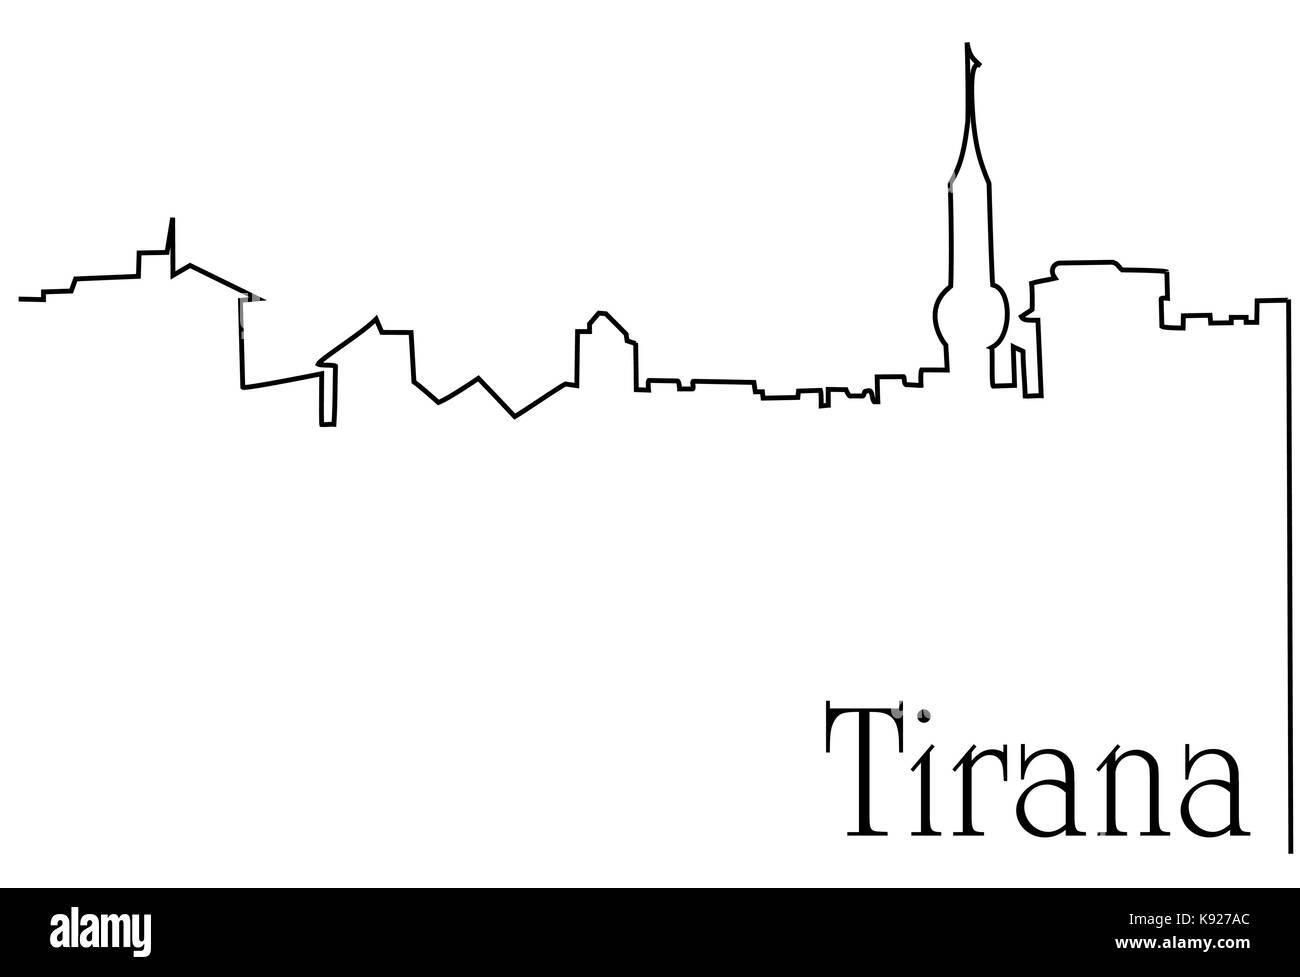 Tirana city one line drawing - Stock Vector